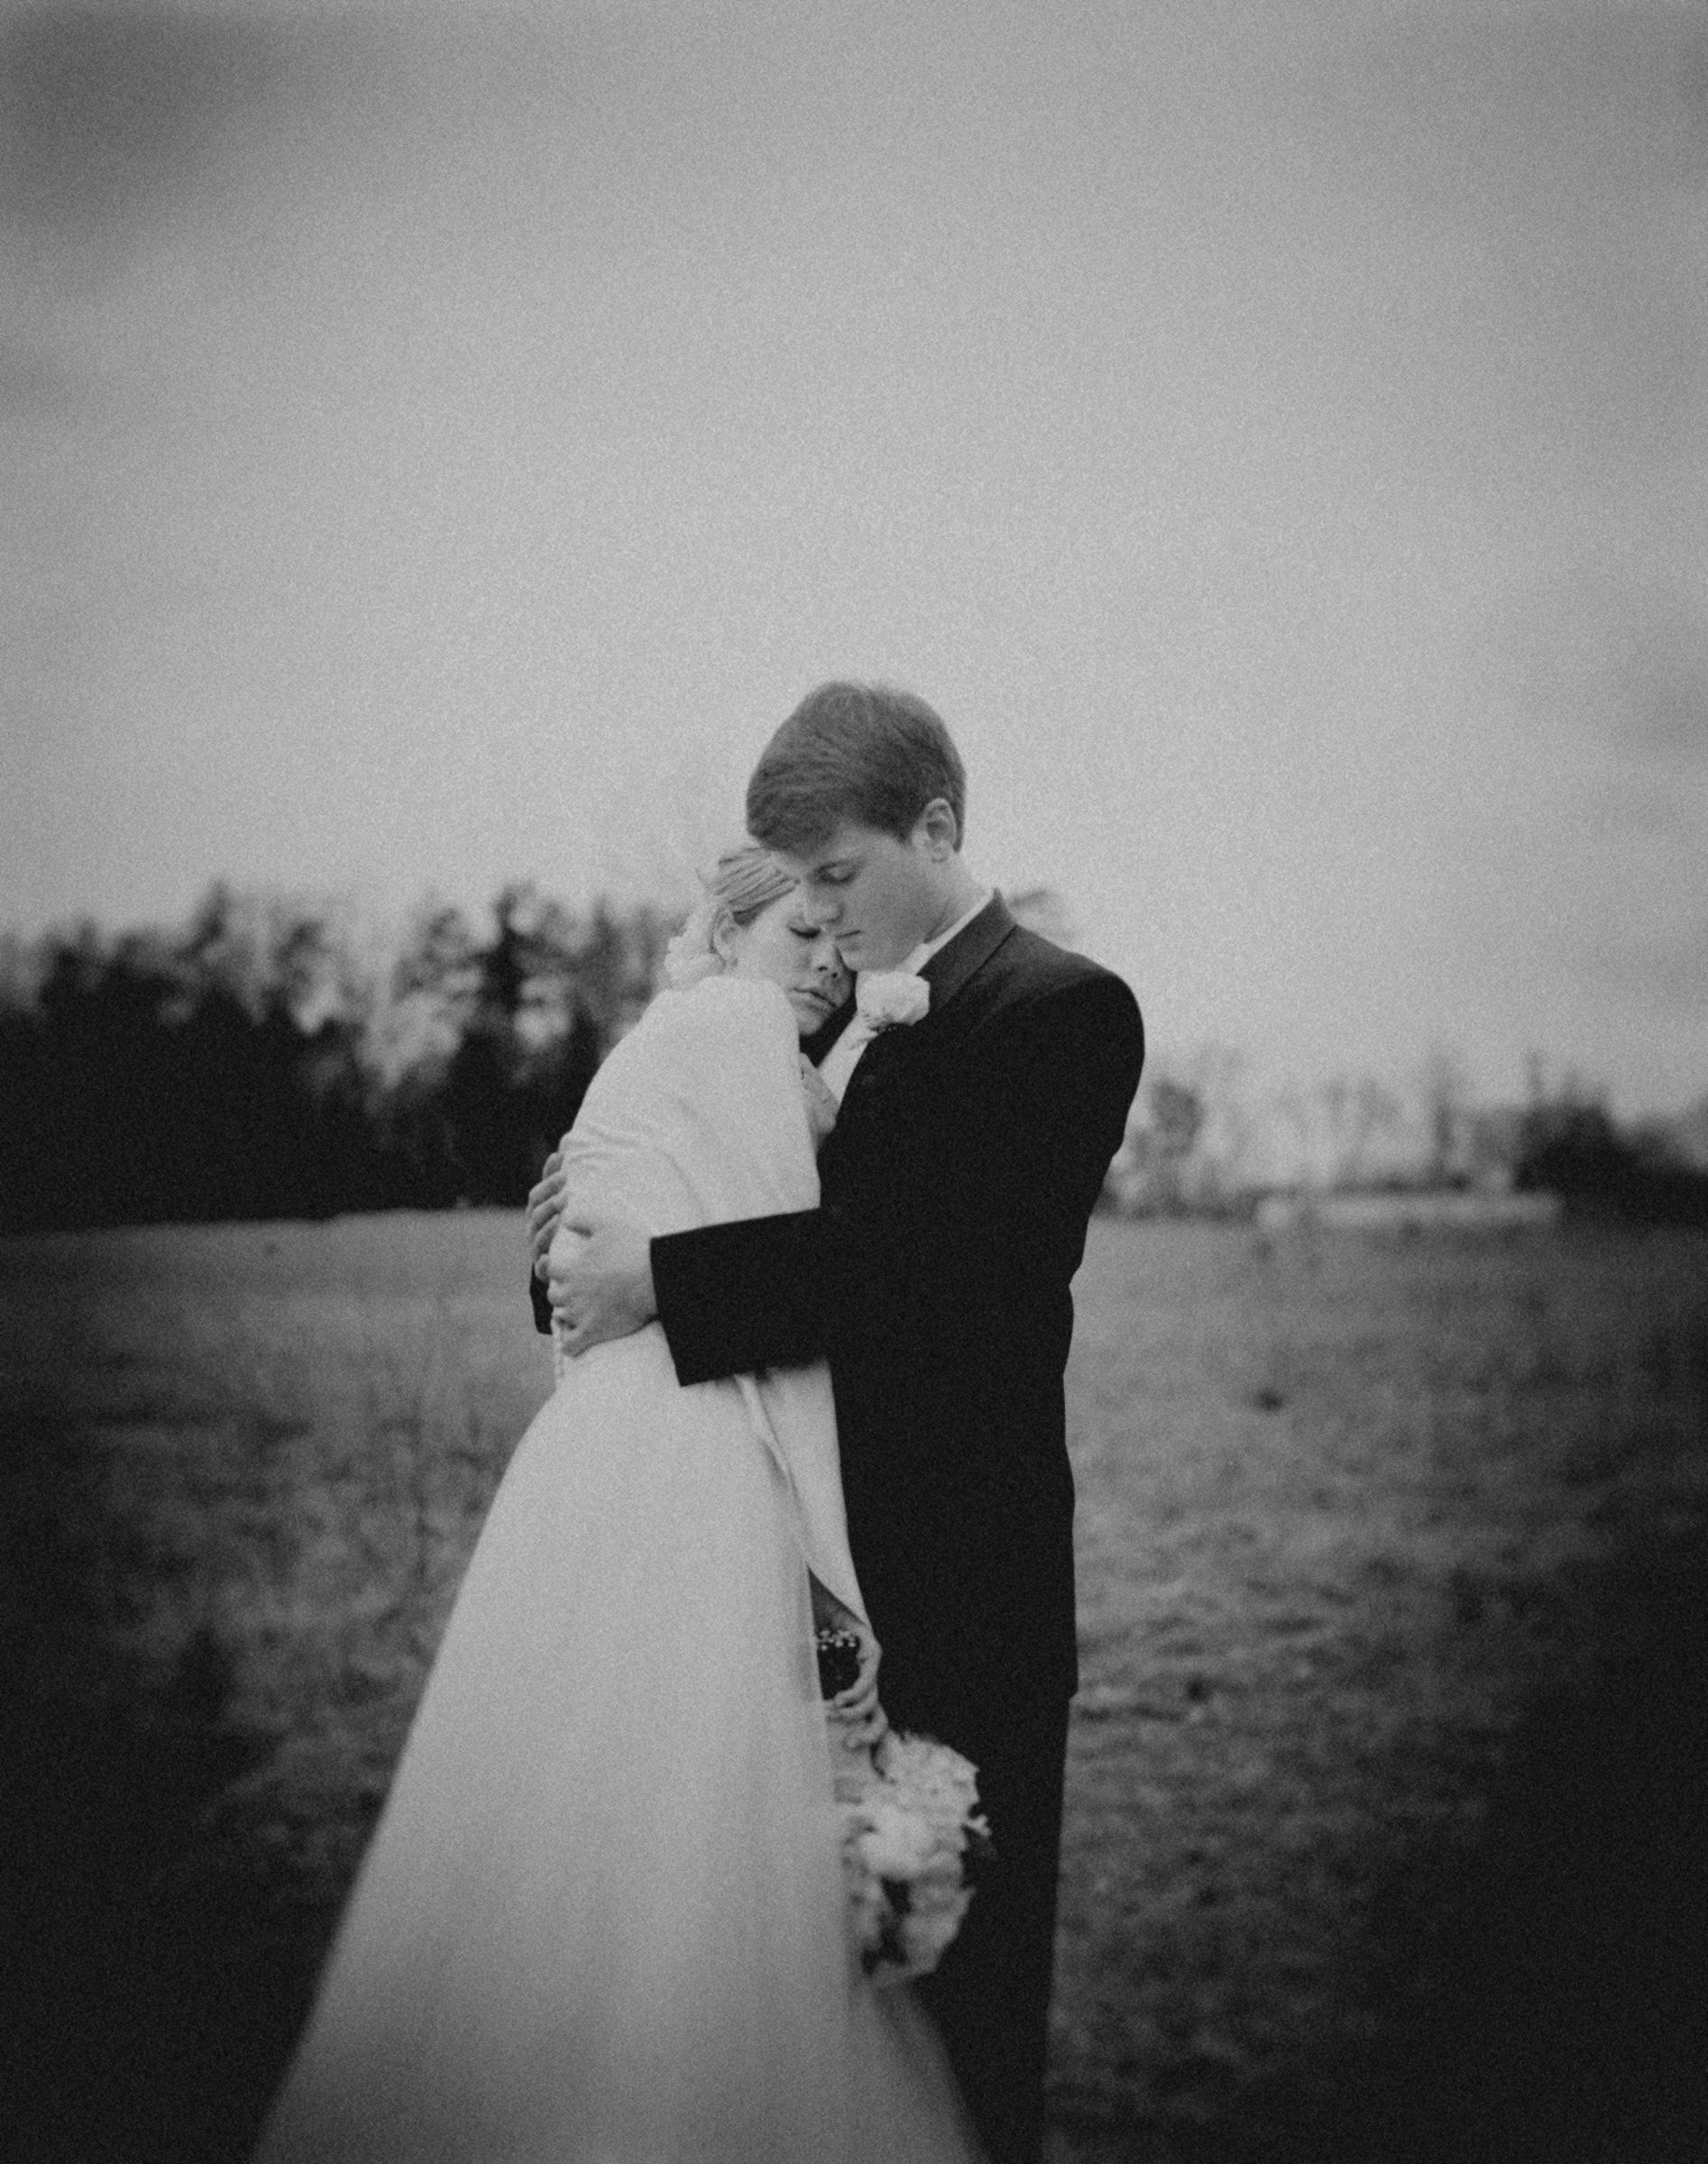 black-white-antique-portrait-bride-and-groom-hugging-by-richard-israel